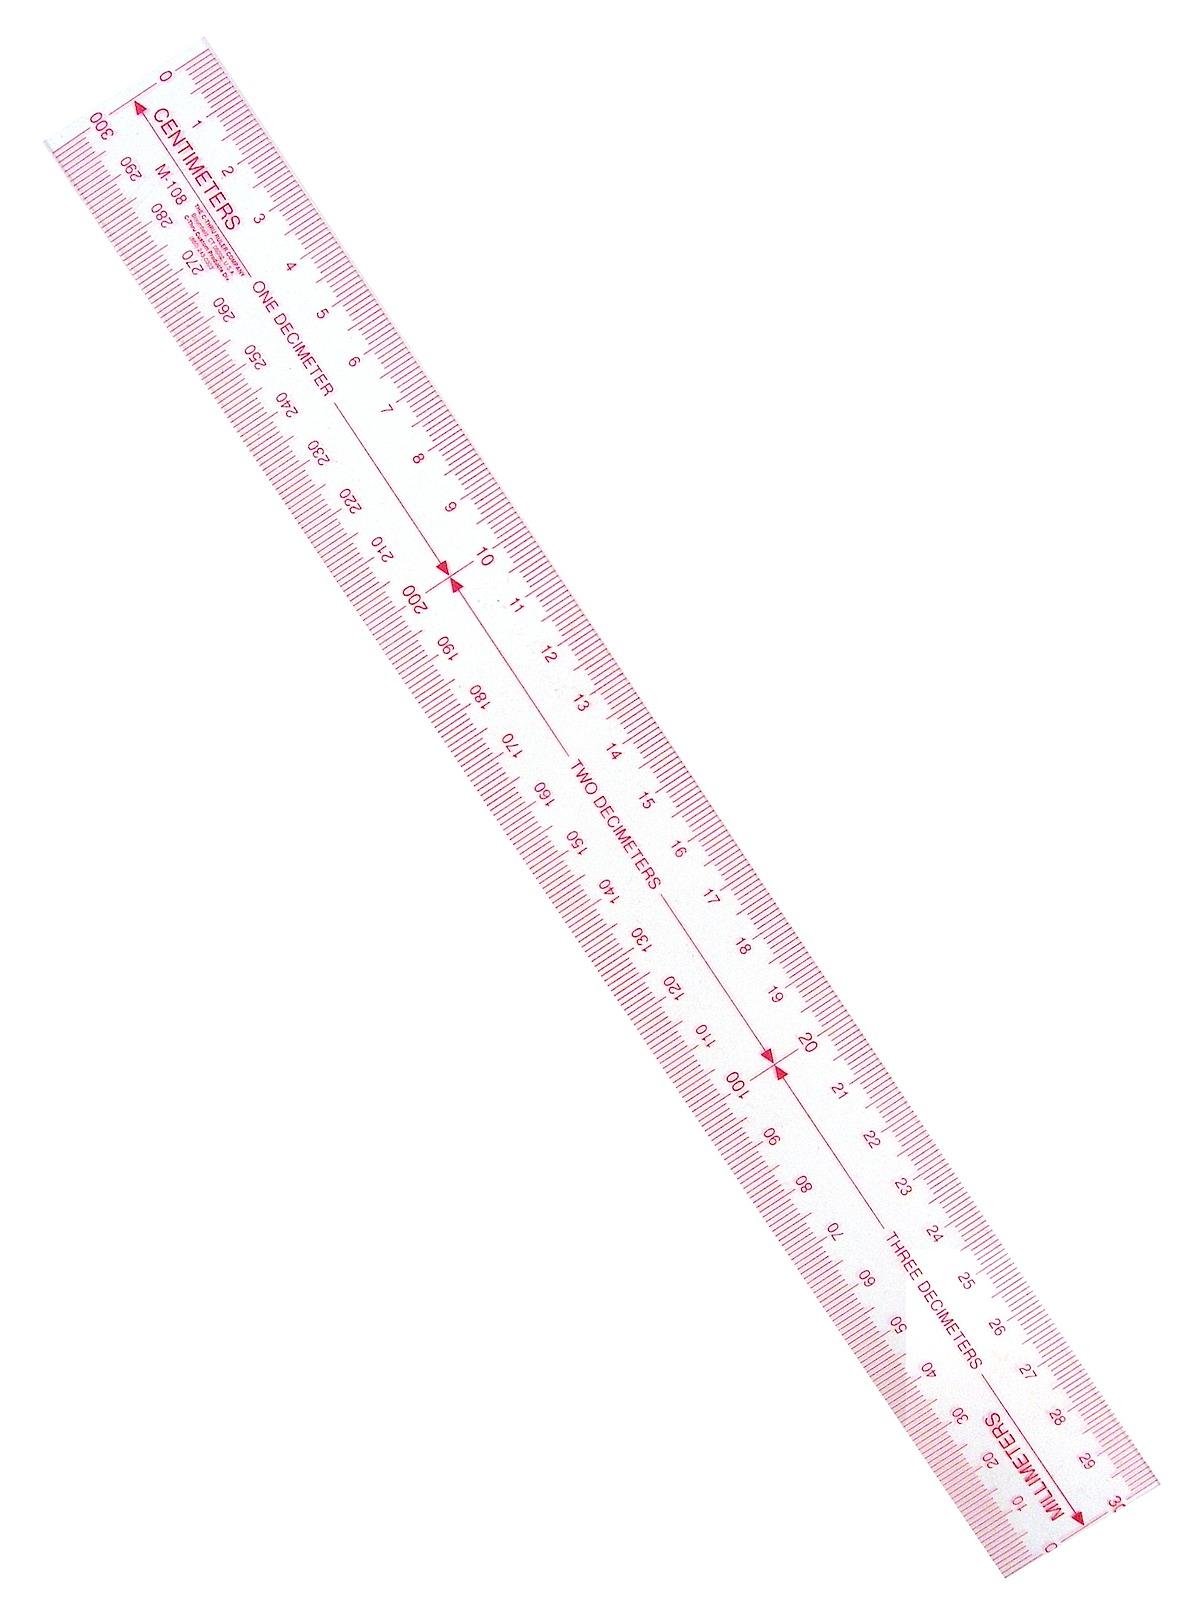 Westcott - Metric Transparent Ruler